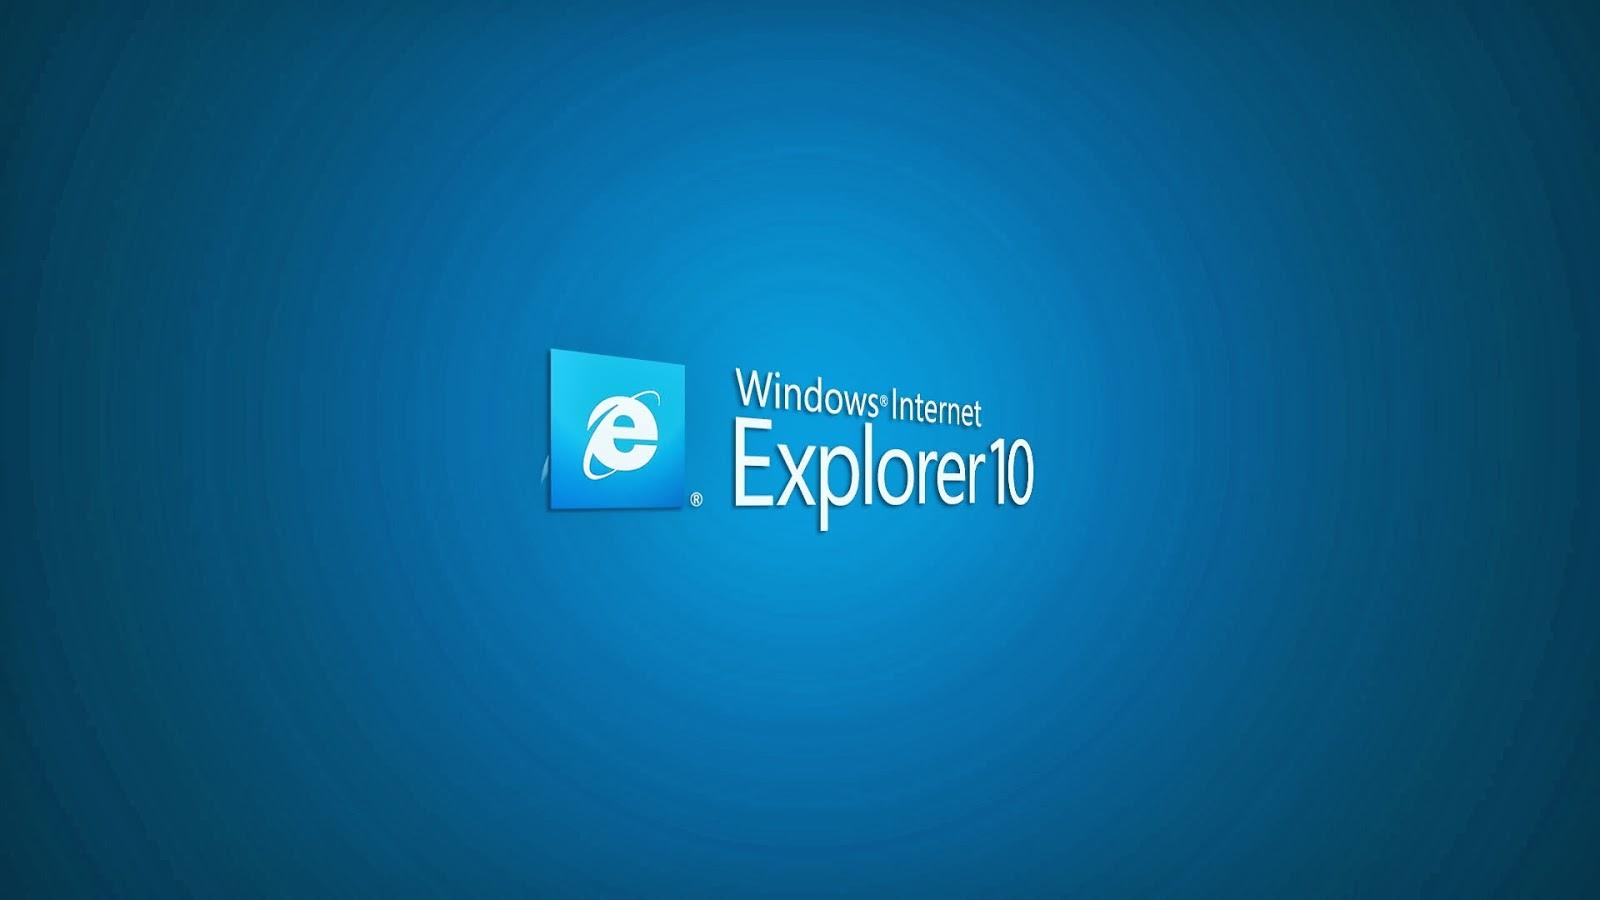 1080P Windows 8 Wallpaper 1600x900